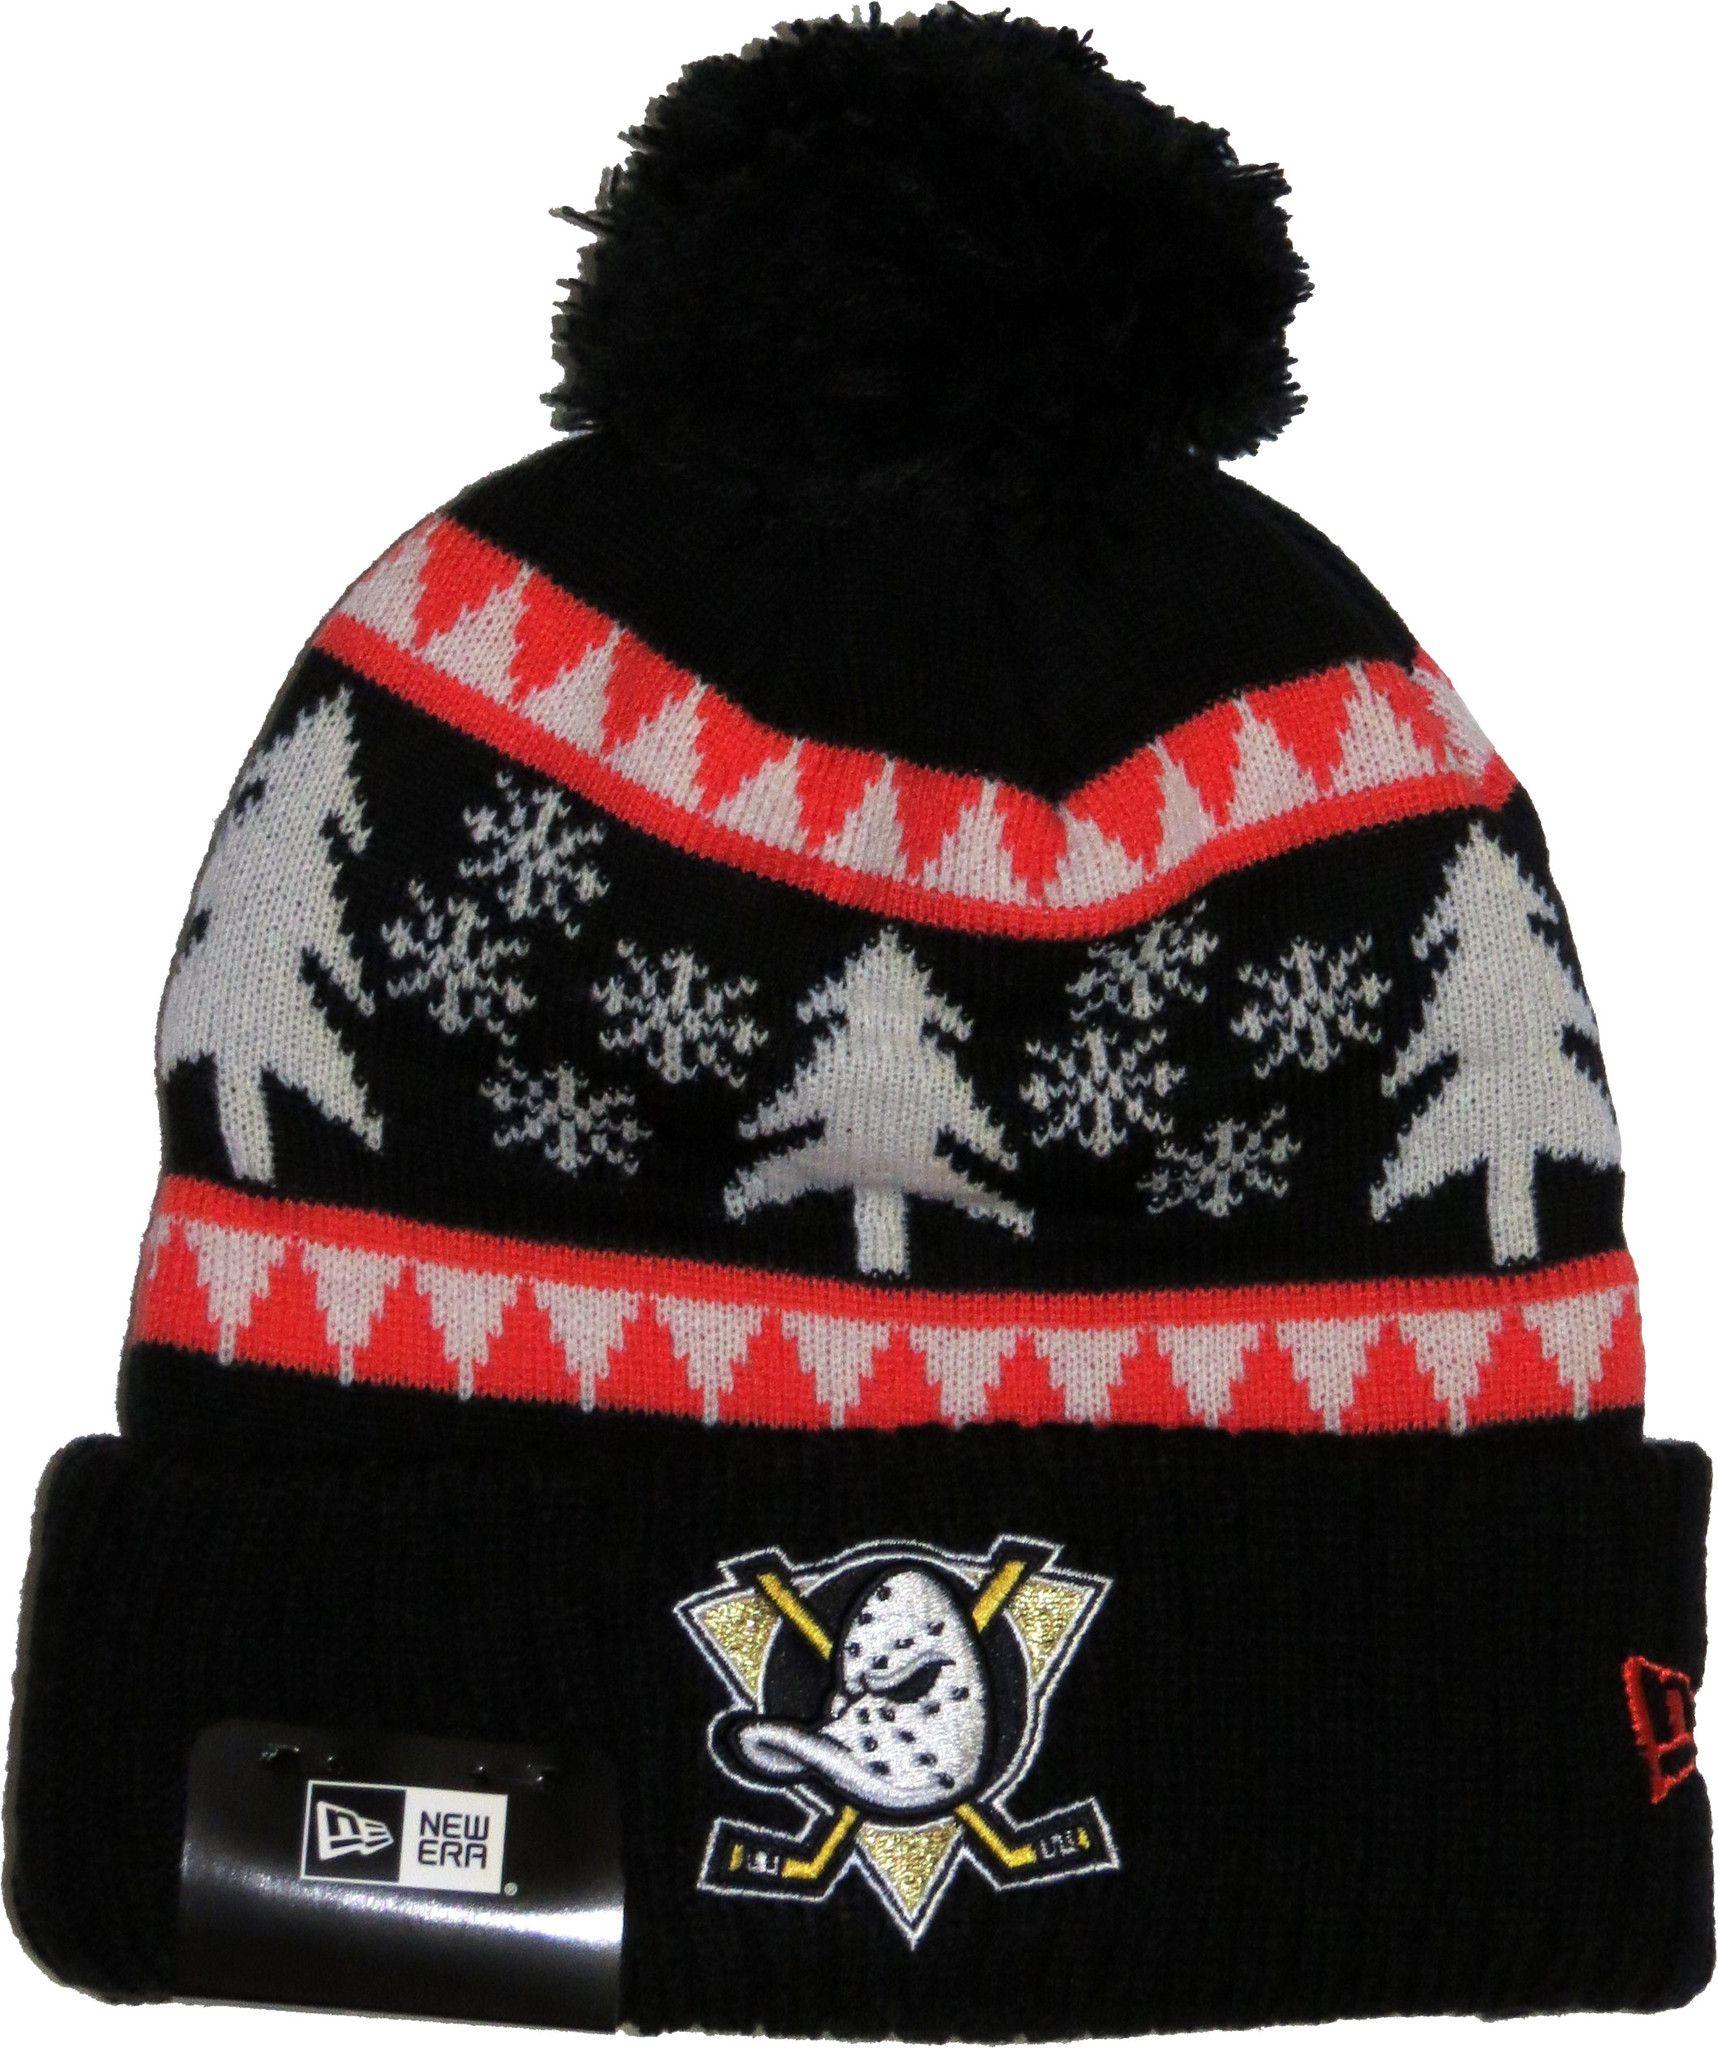 6d8f71338 Anaheim Mighty Ducks New Era NFL Team Snow Pine Bobble Hat | Winter ...